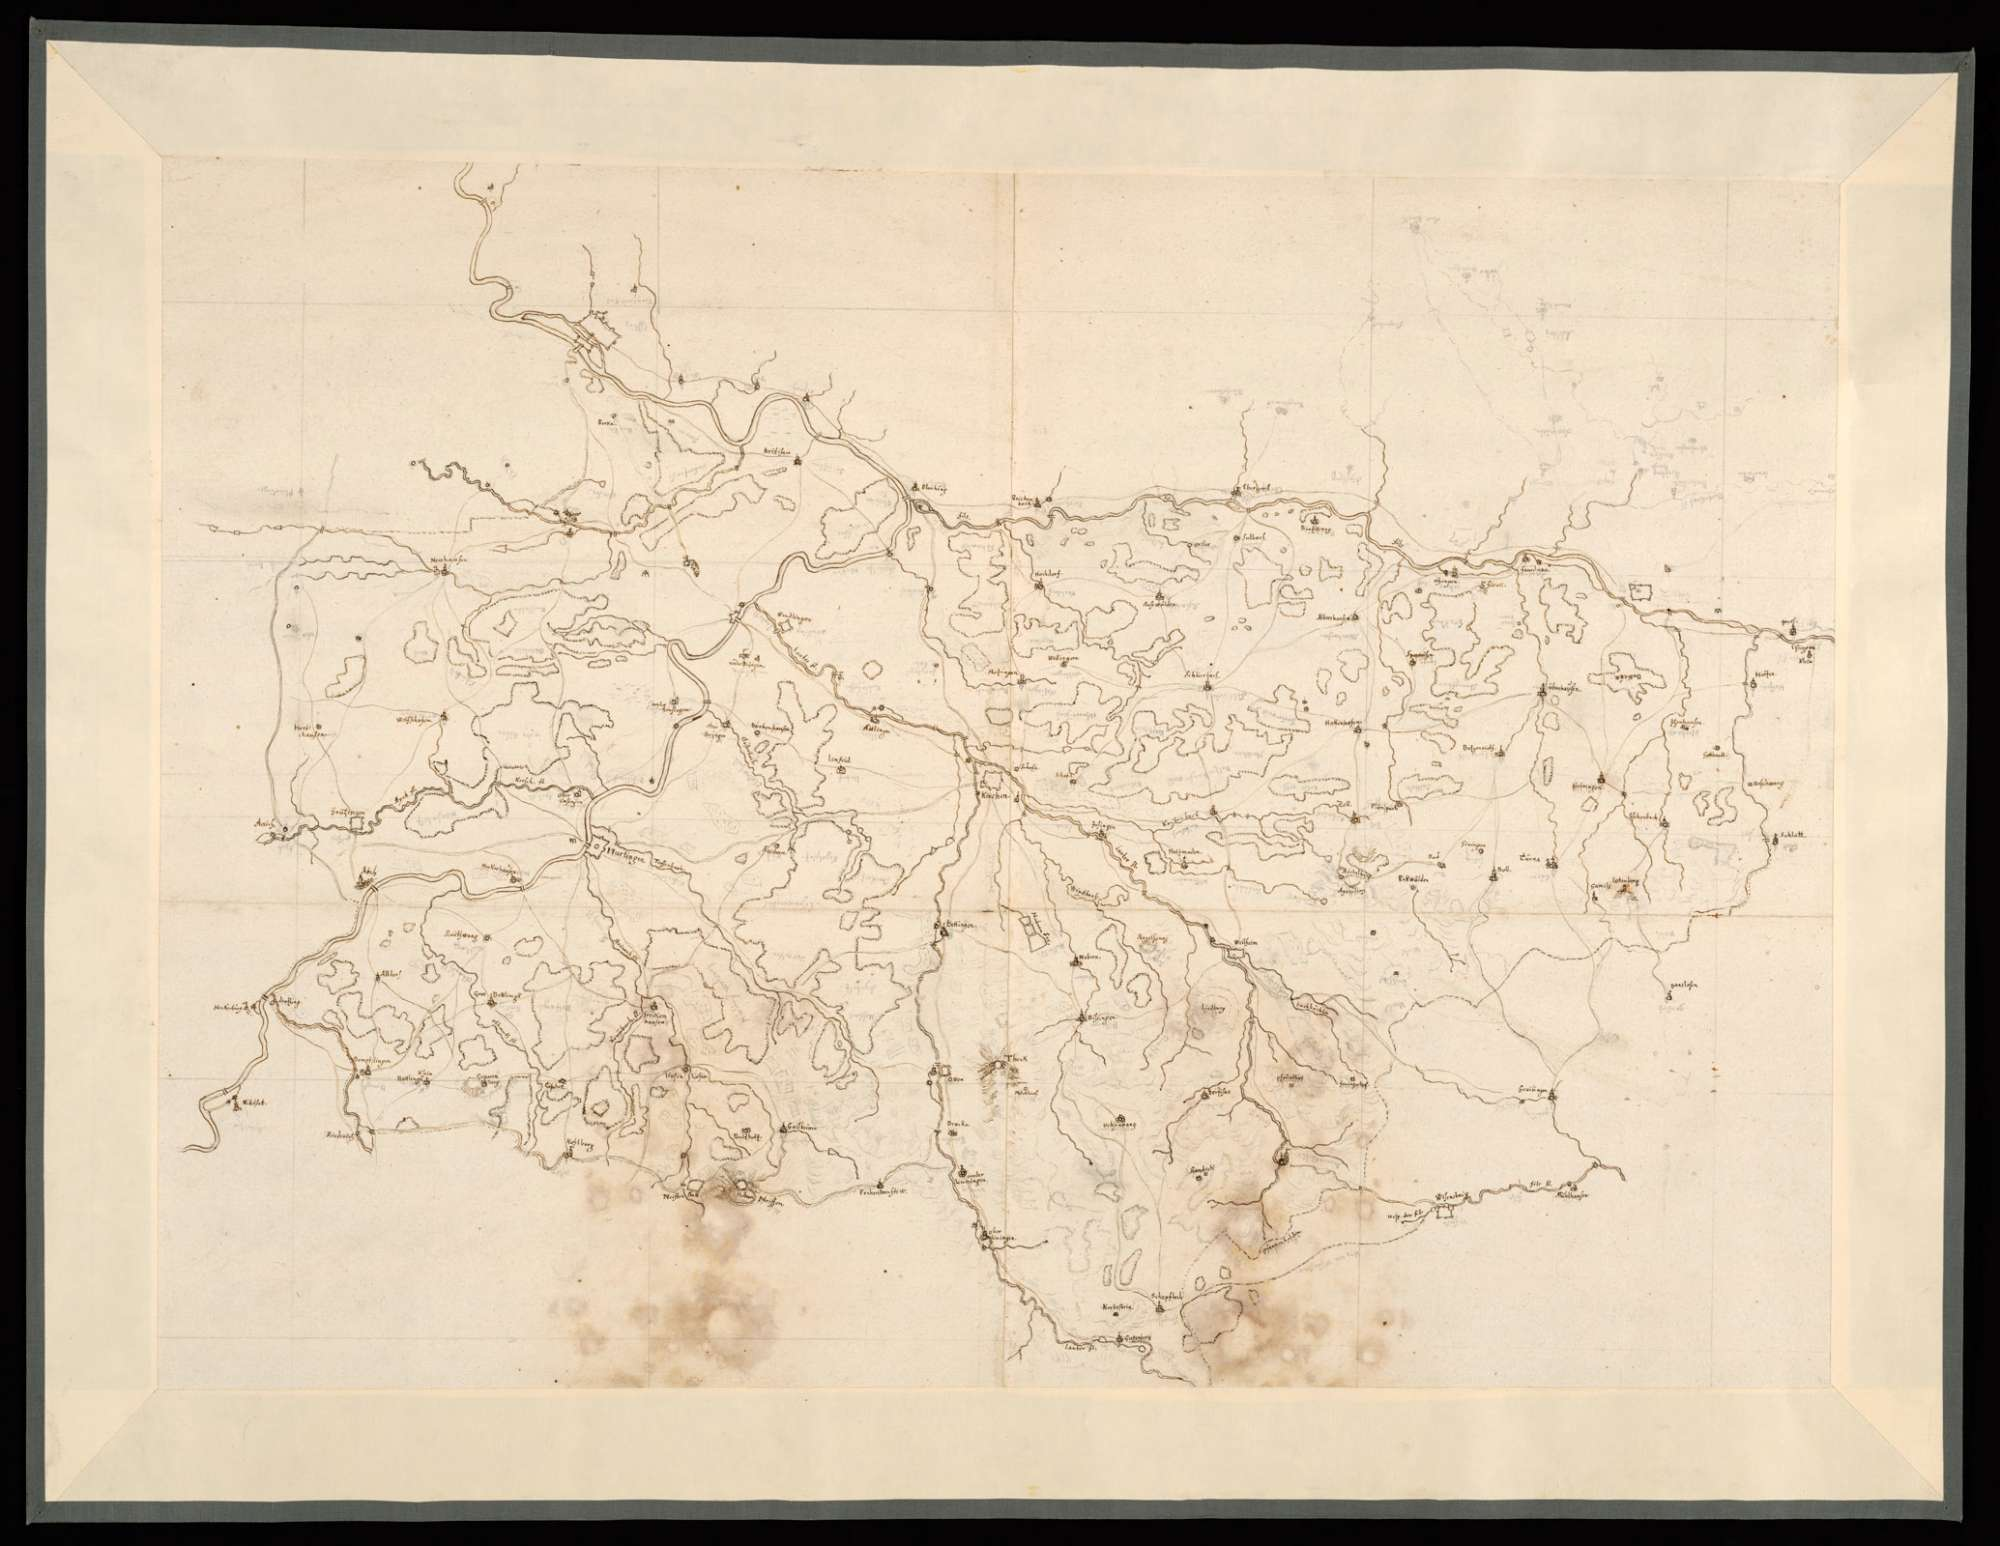 [Karte des Kirchheimer Forsts], Bild 1